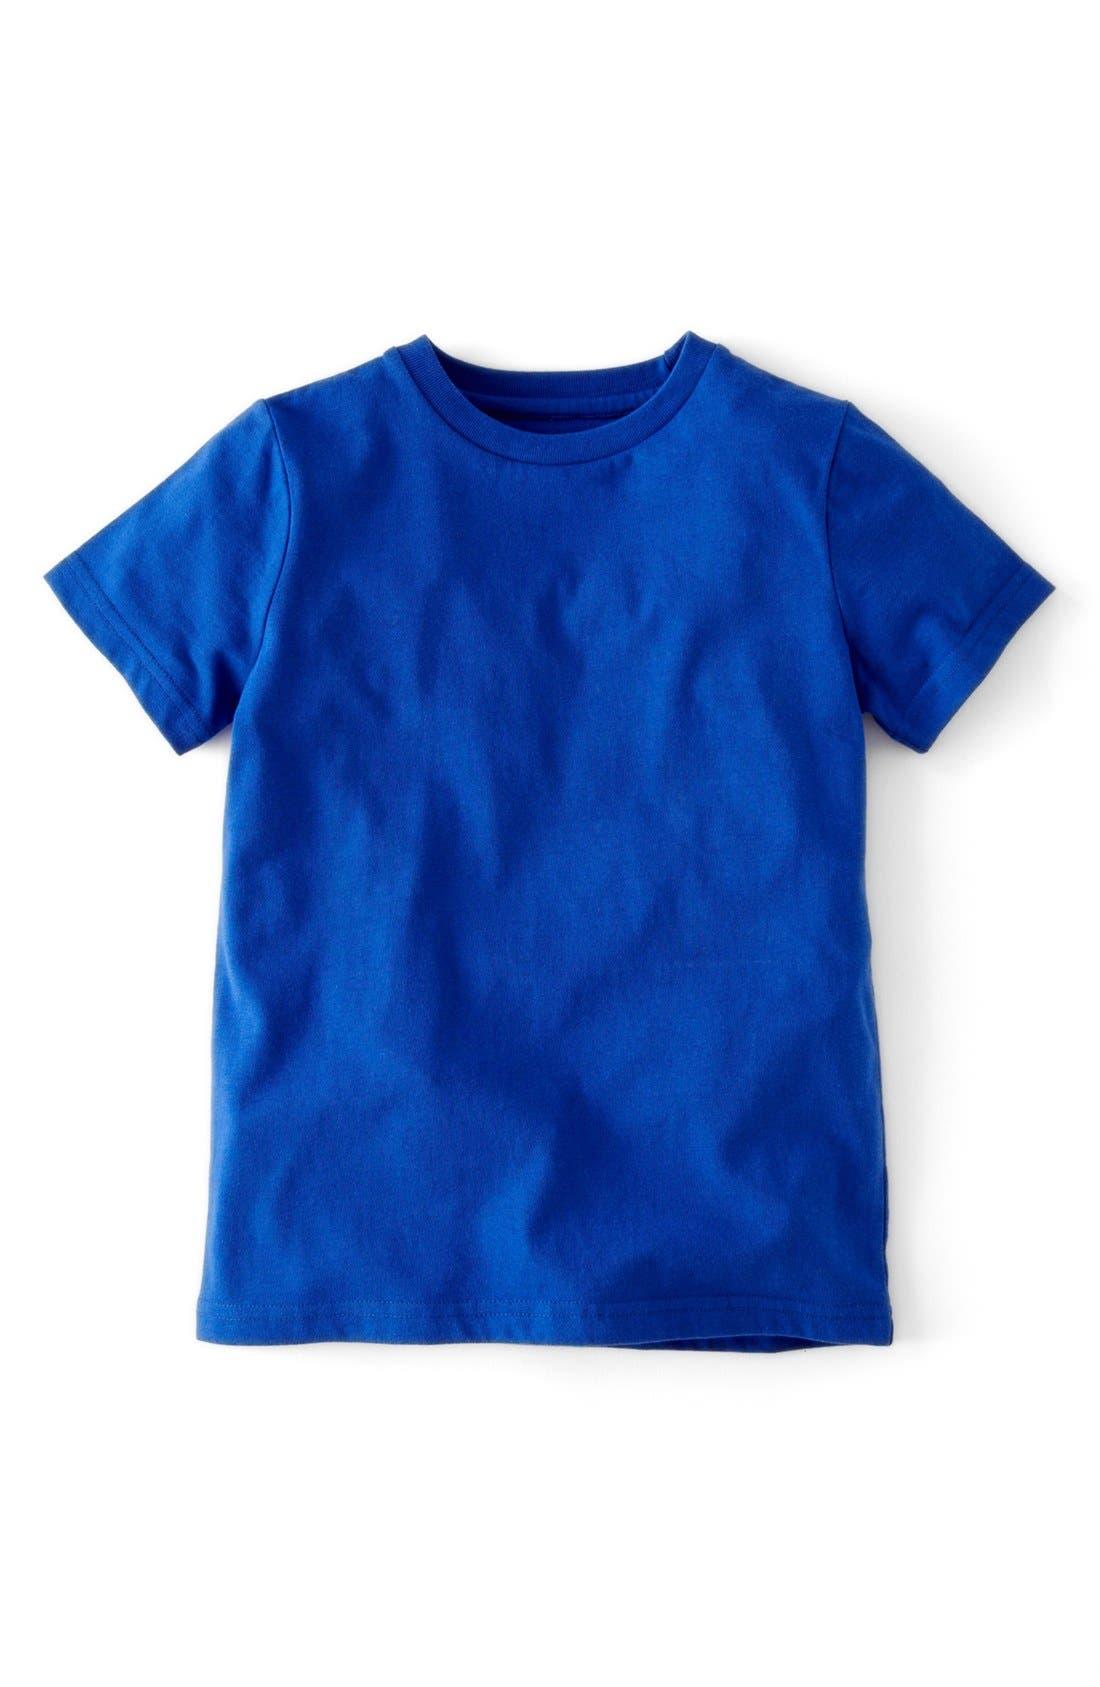 Main Image - Mini Boden T-Shirt (Toddler Boys, Little Boys & Big Boys)